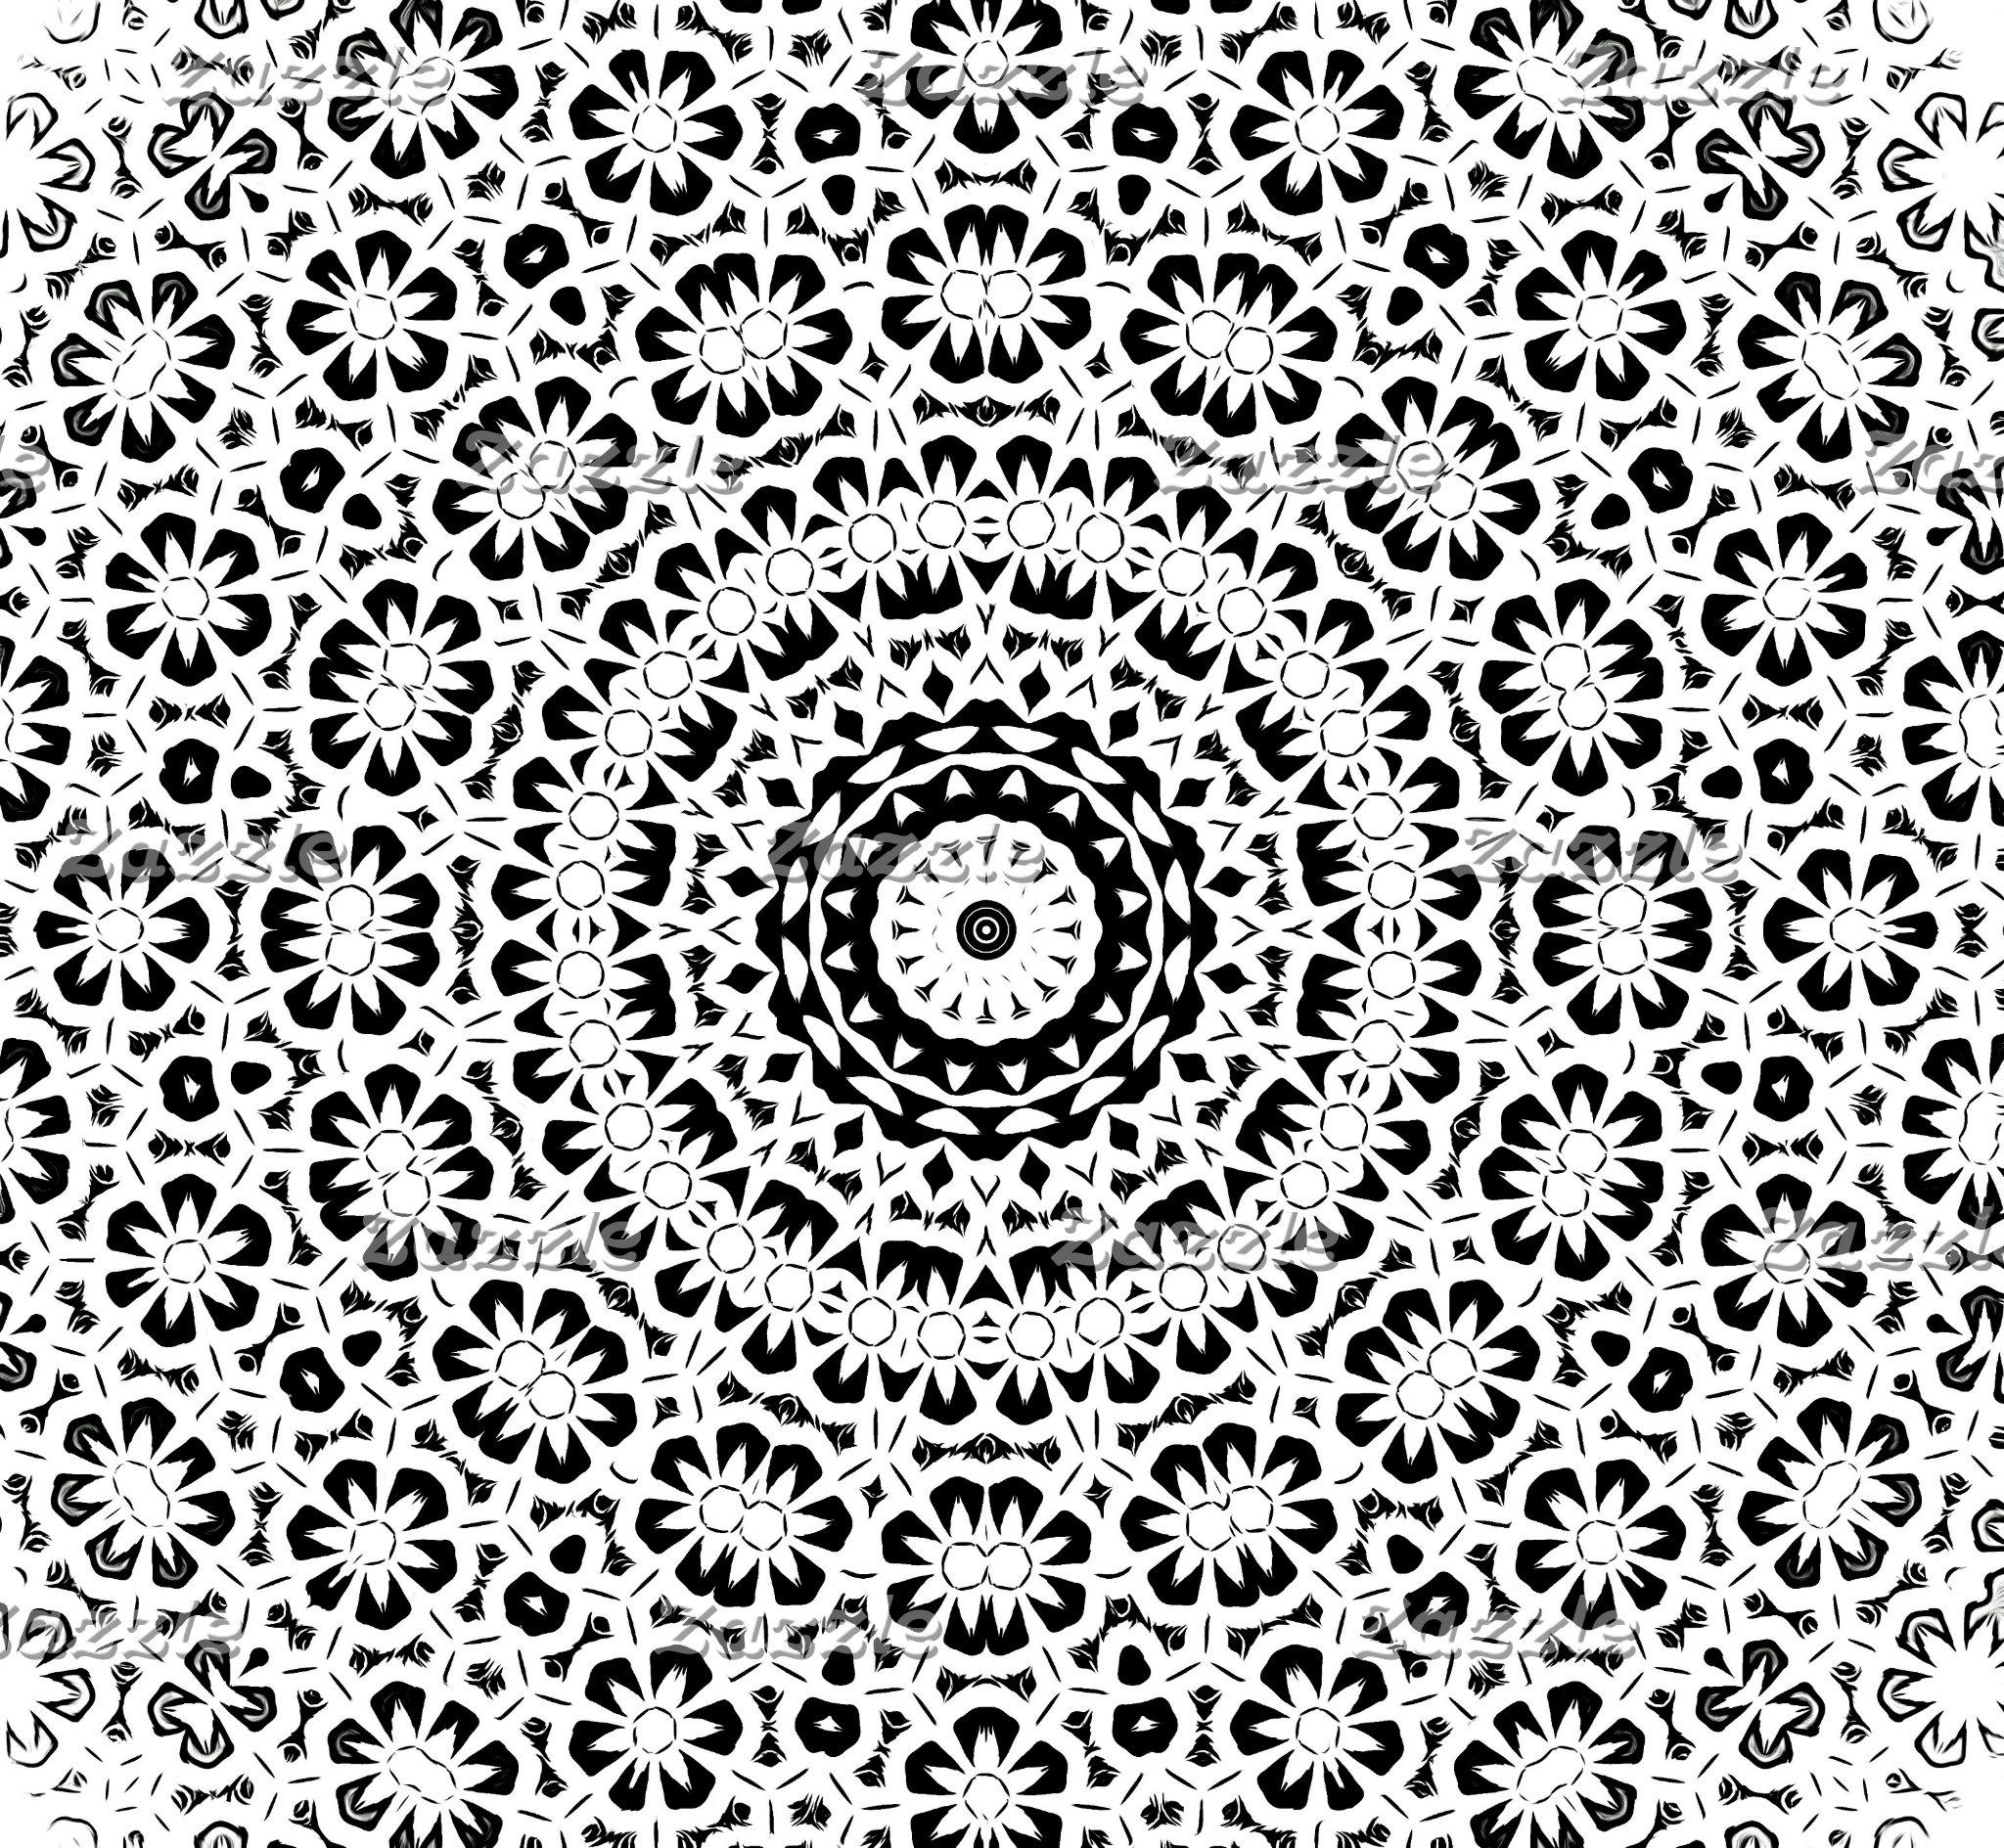 Black and White Kaleidoscope Pattern II